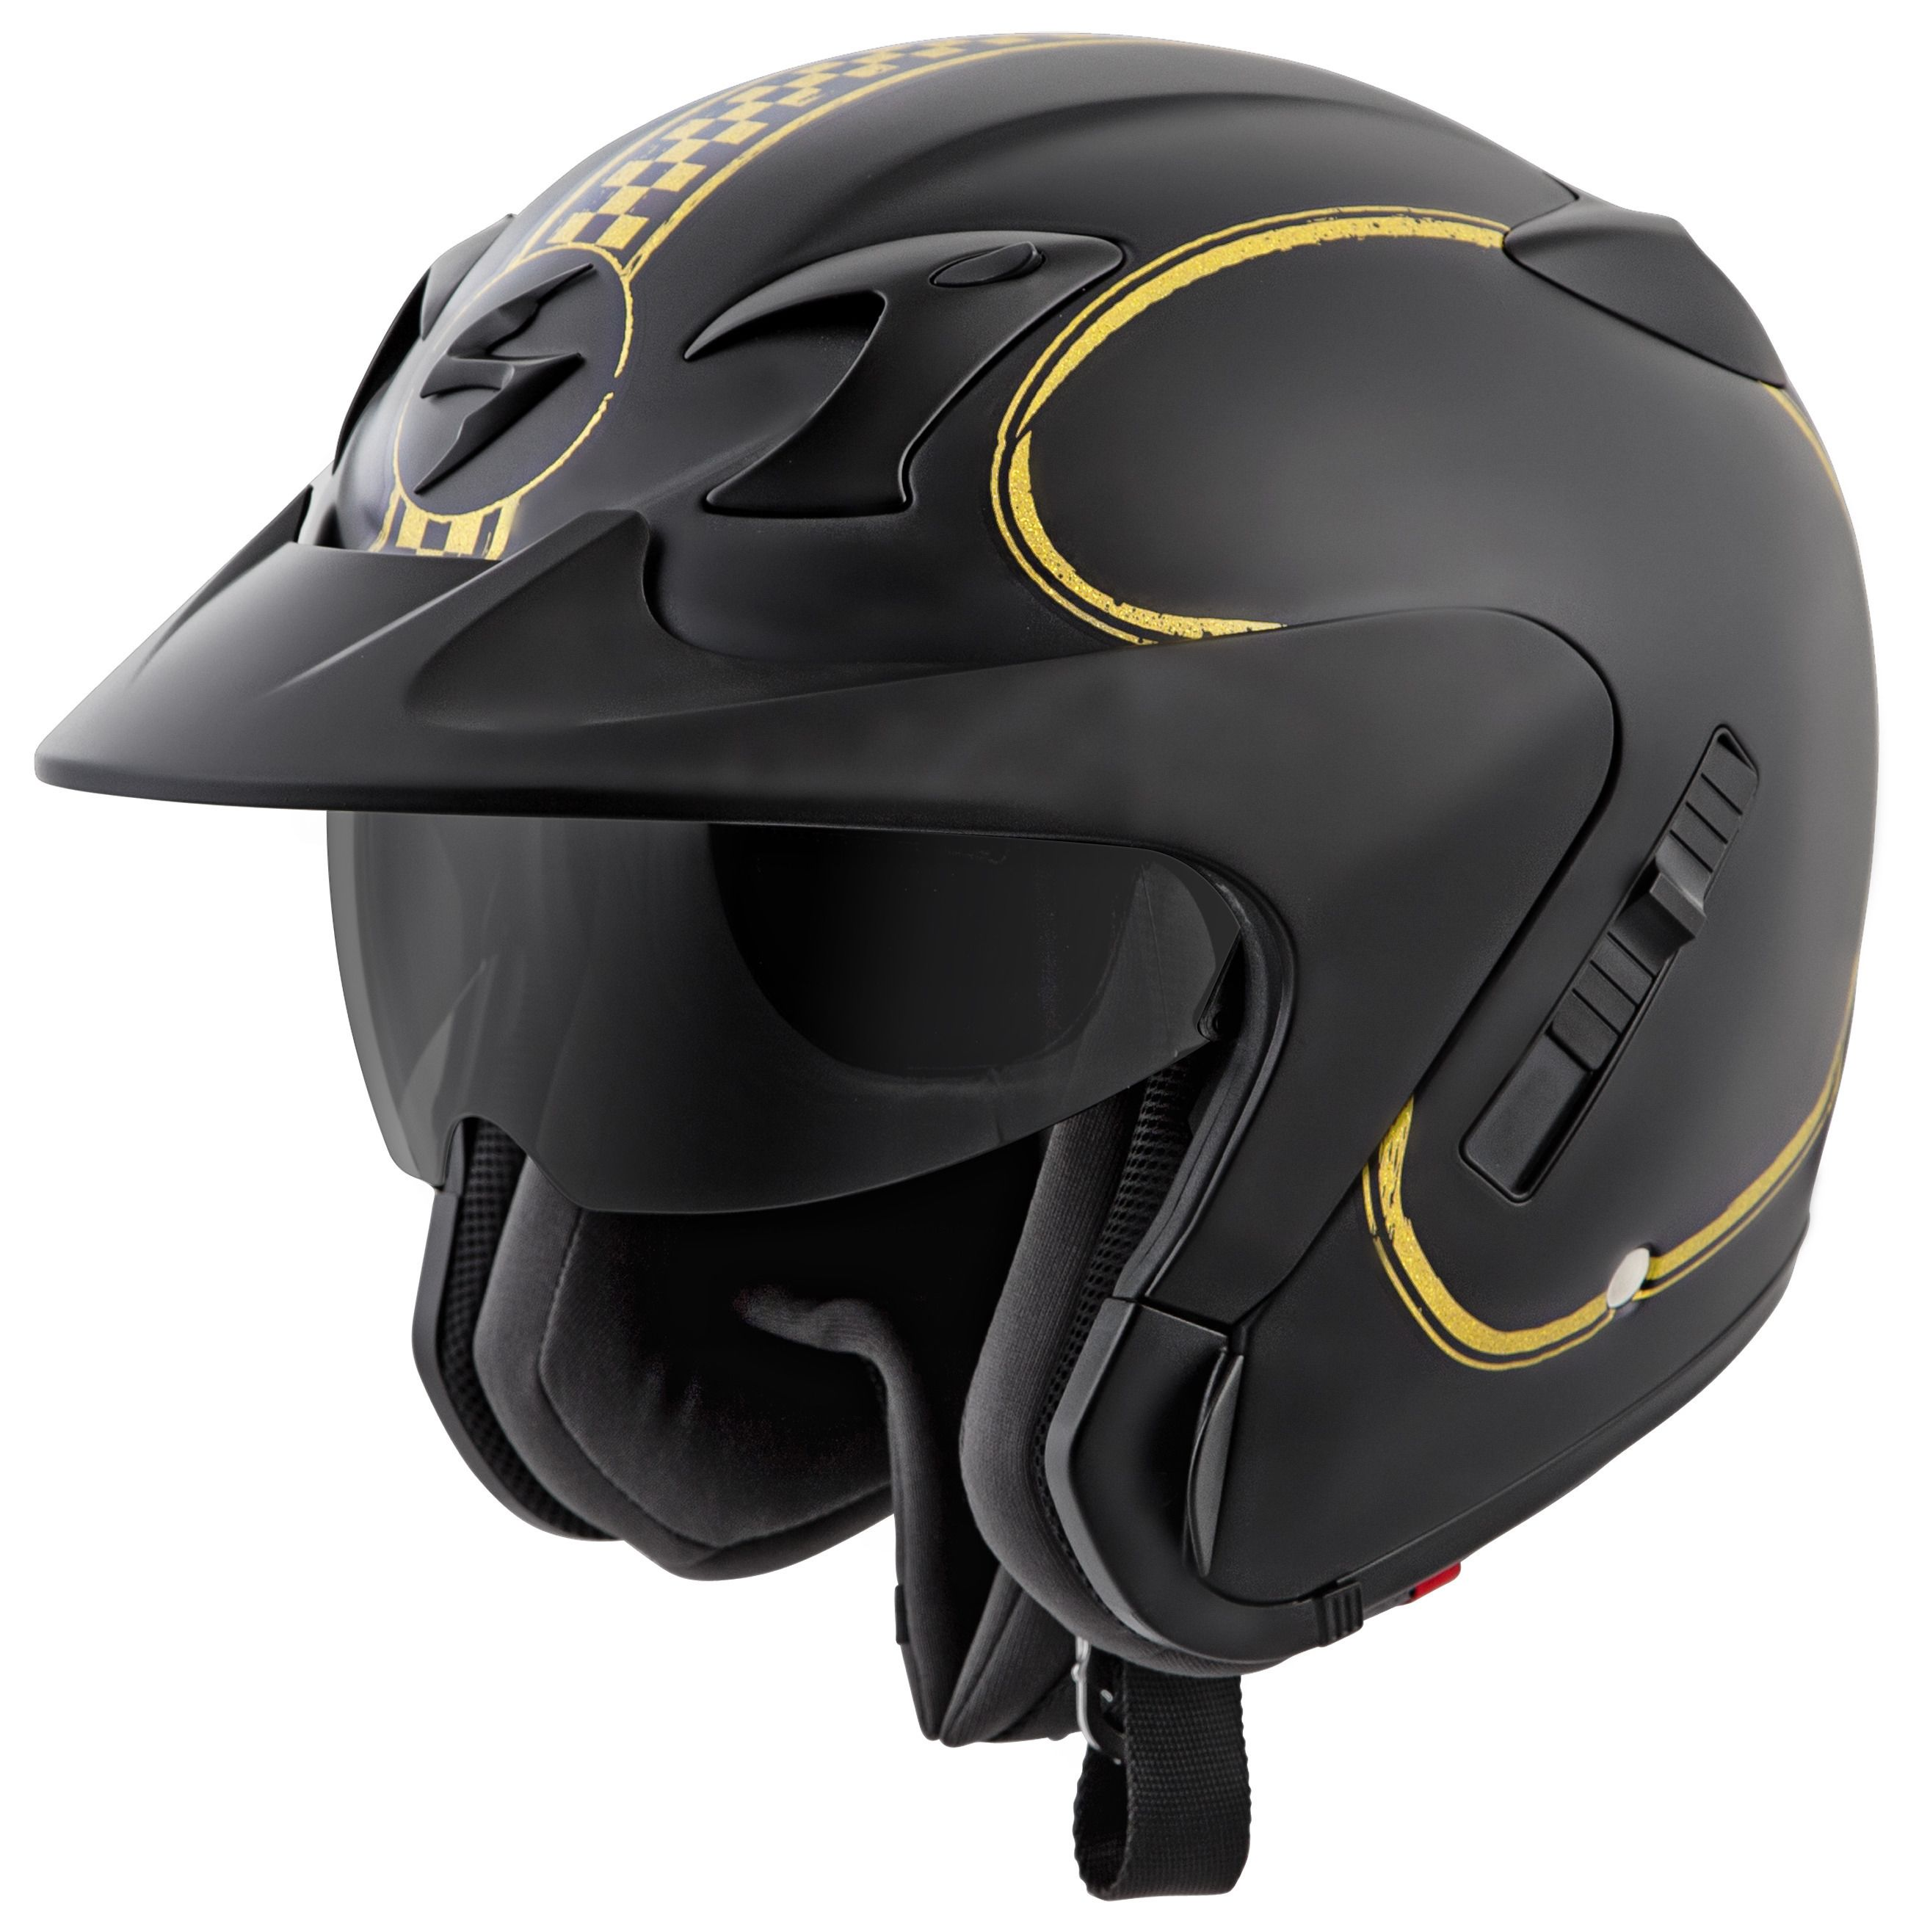 scorpion exo ct220 bixby helmet revzilla. Black Bedroom Furniture Sets. Home Design Ideas